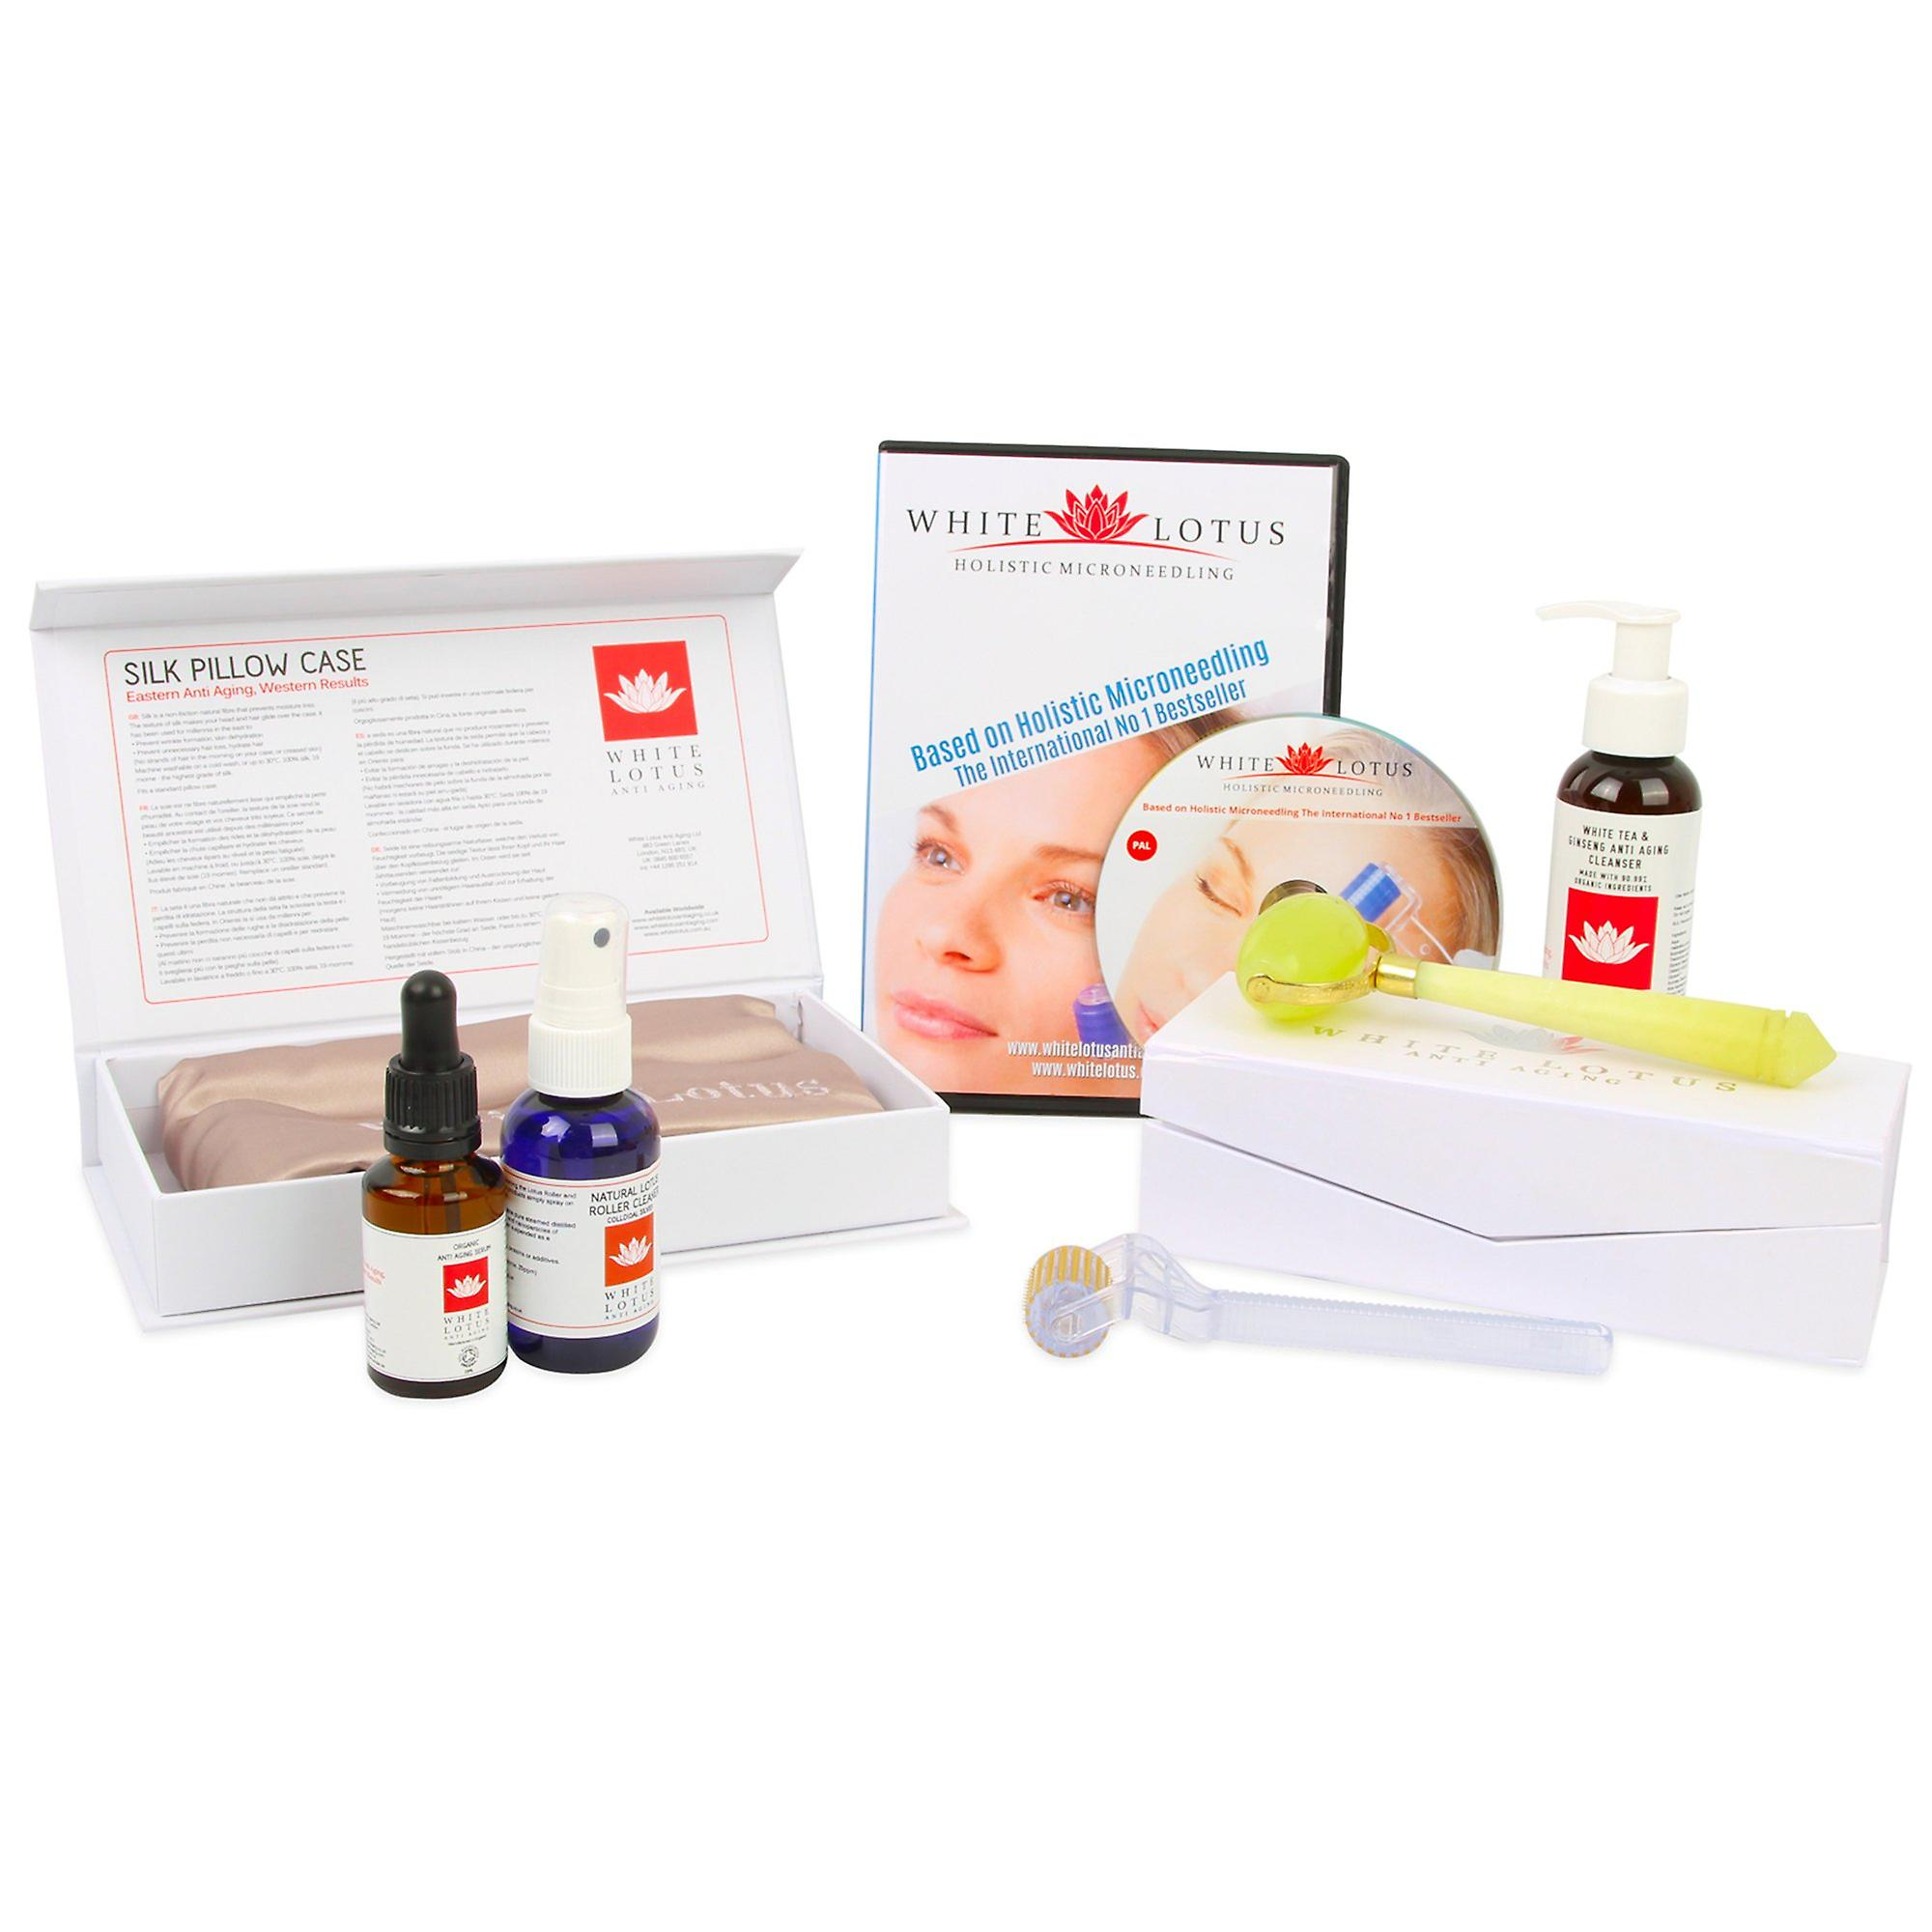 Deluxe hypoallergenic dermaroller kit - for wrinkles & anti aging